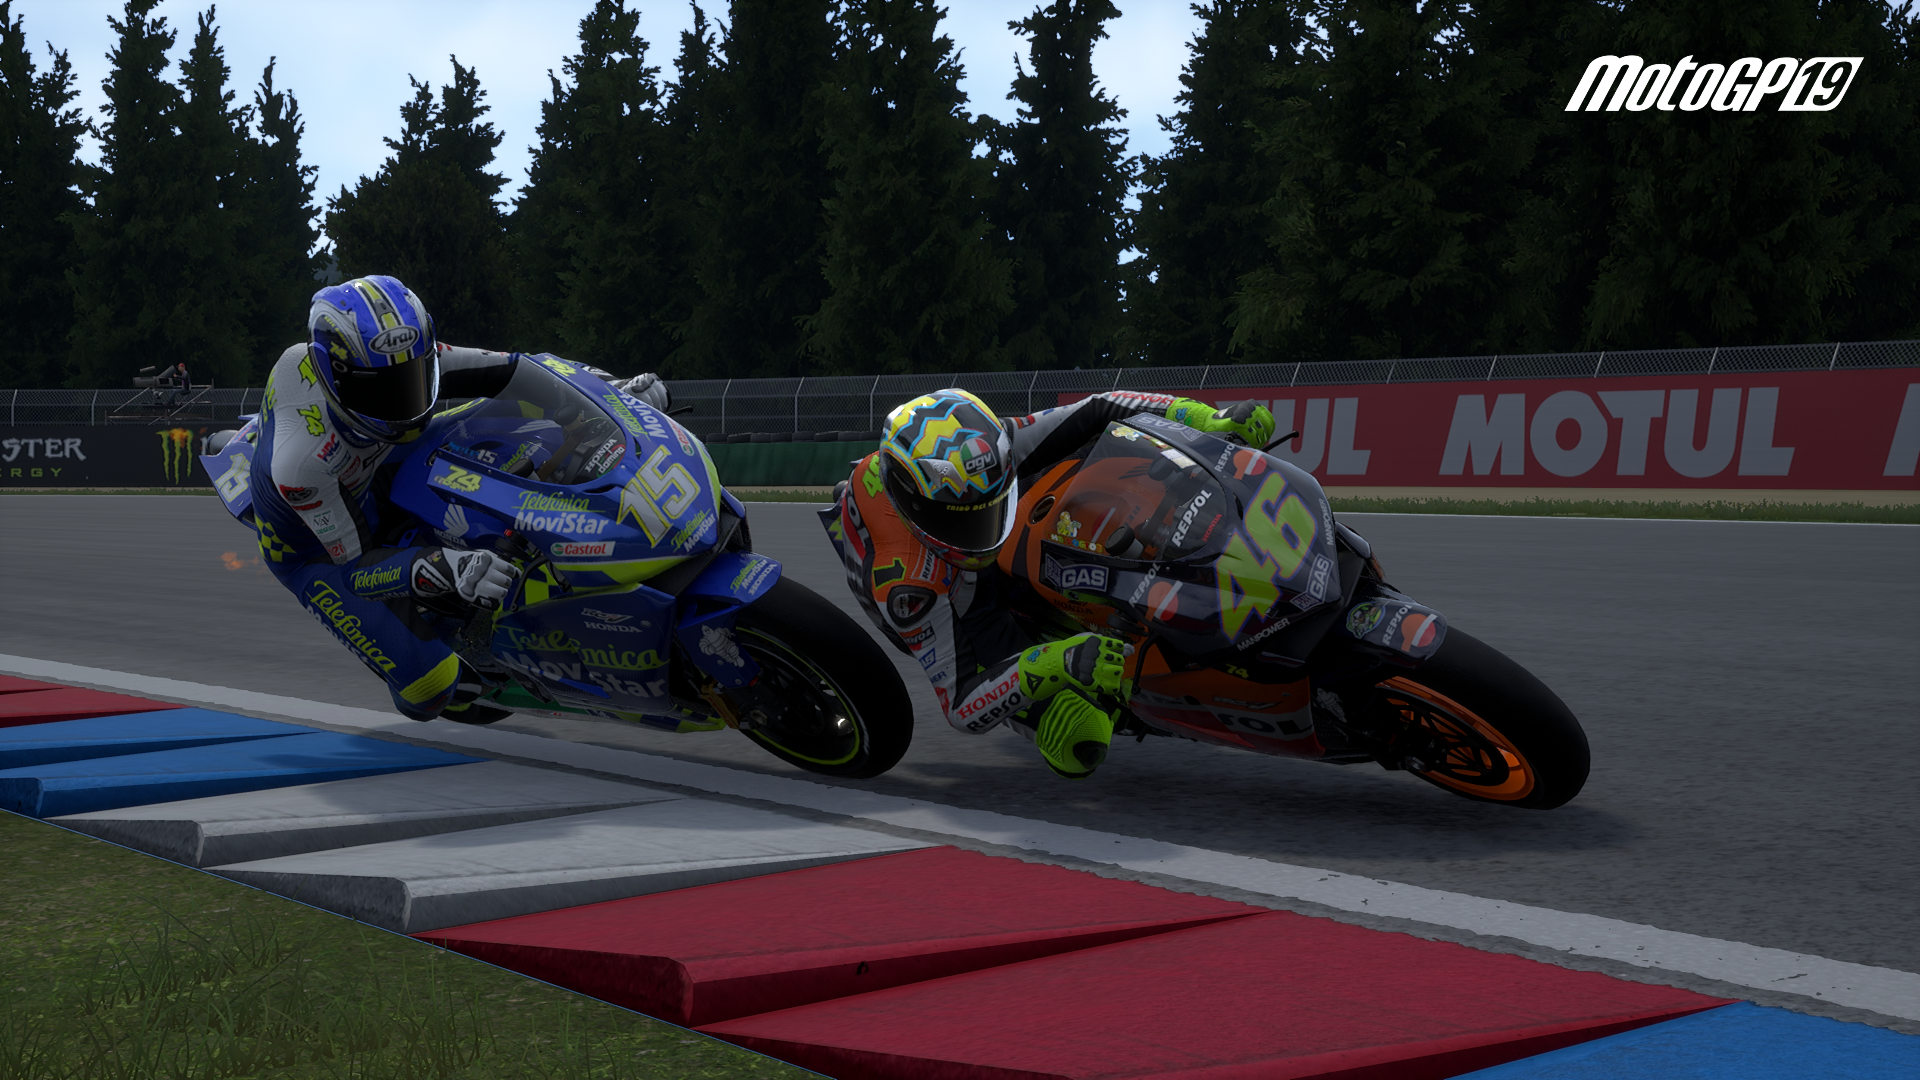 Moto GP 19 Review